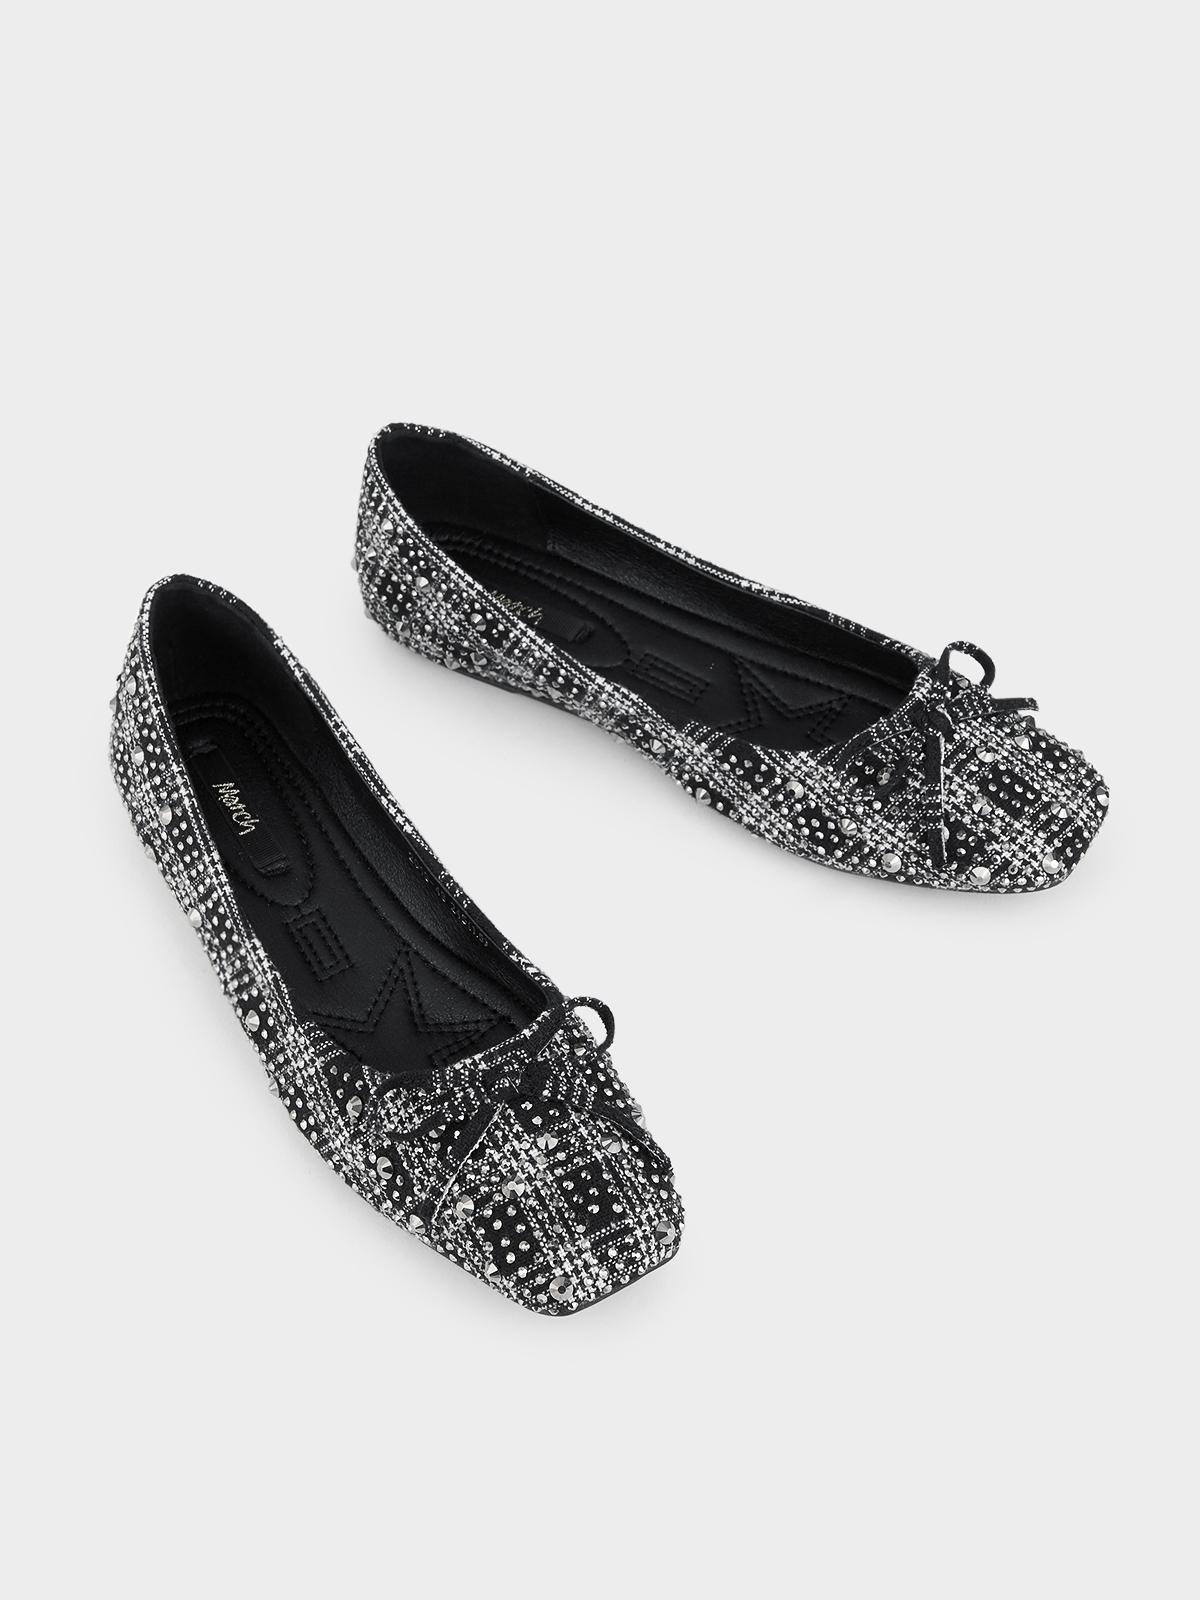 March Shoes Scotchy Flats Black